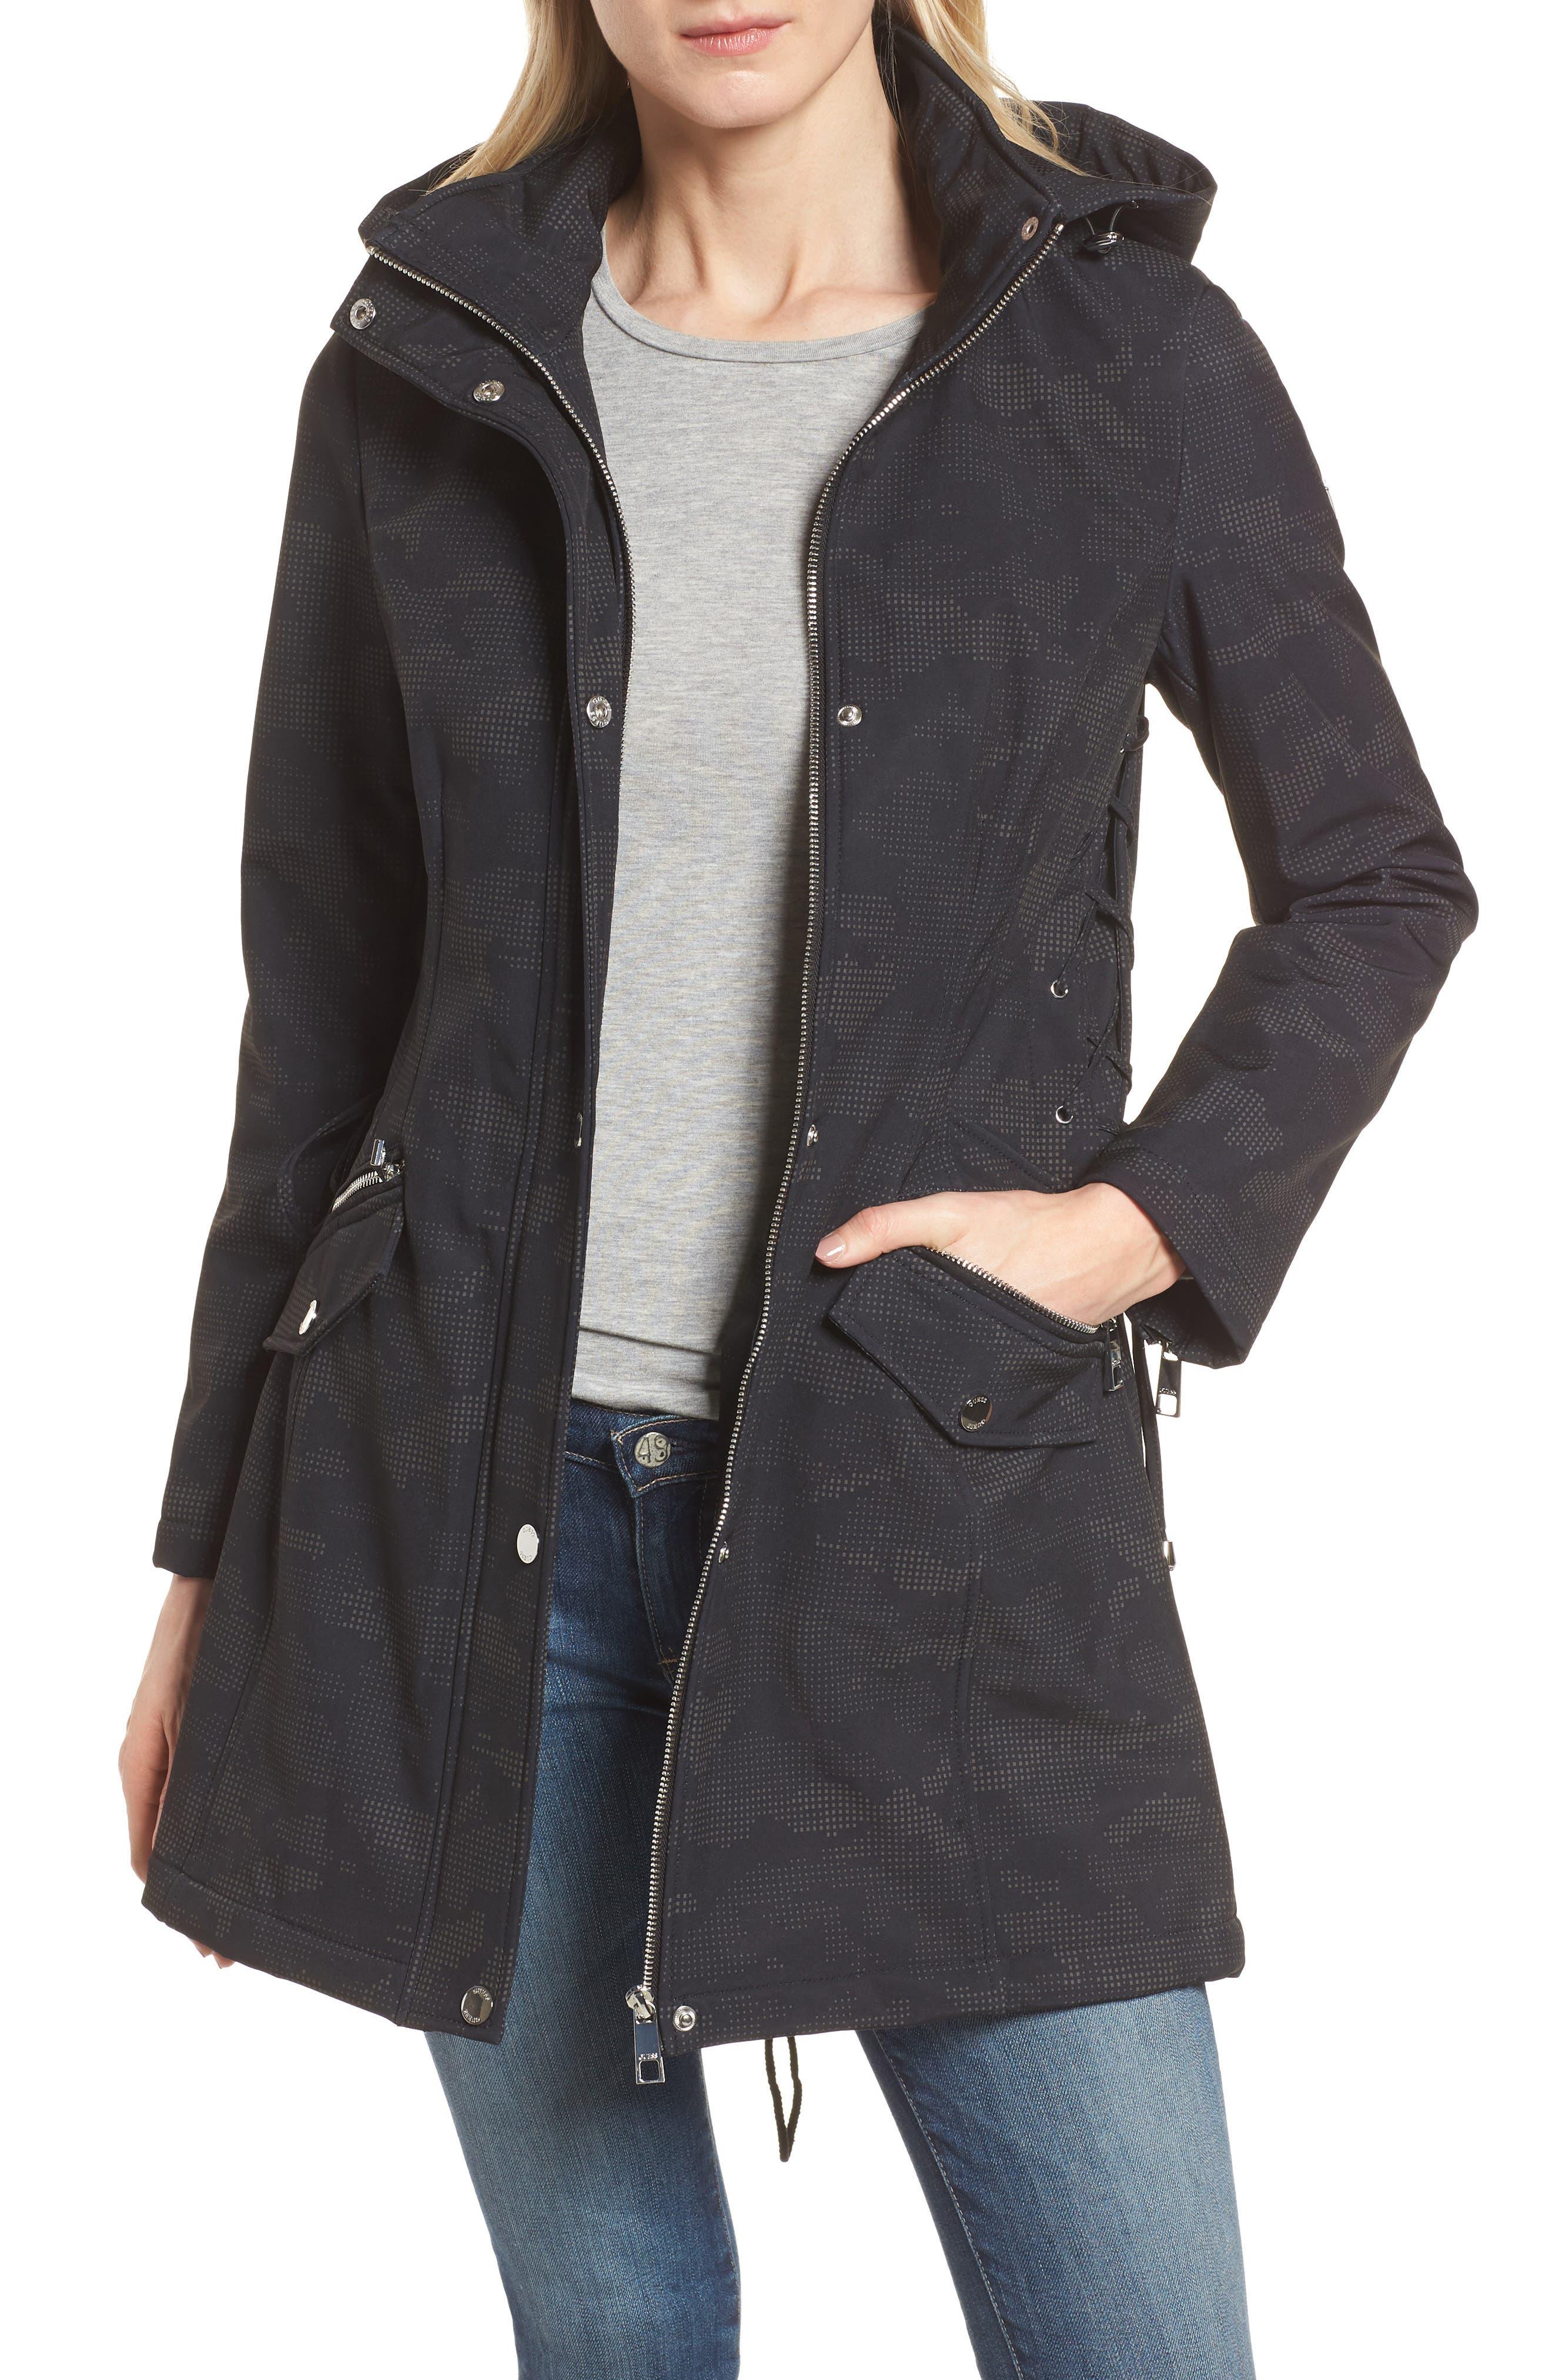 Lace-Up Hooded Jacket,                             Main thumbnail 1, color,                             Black Print